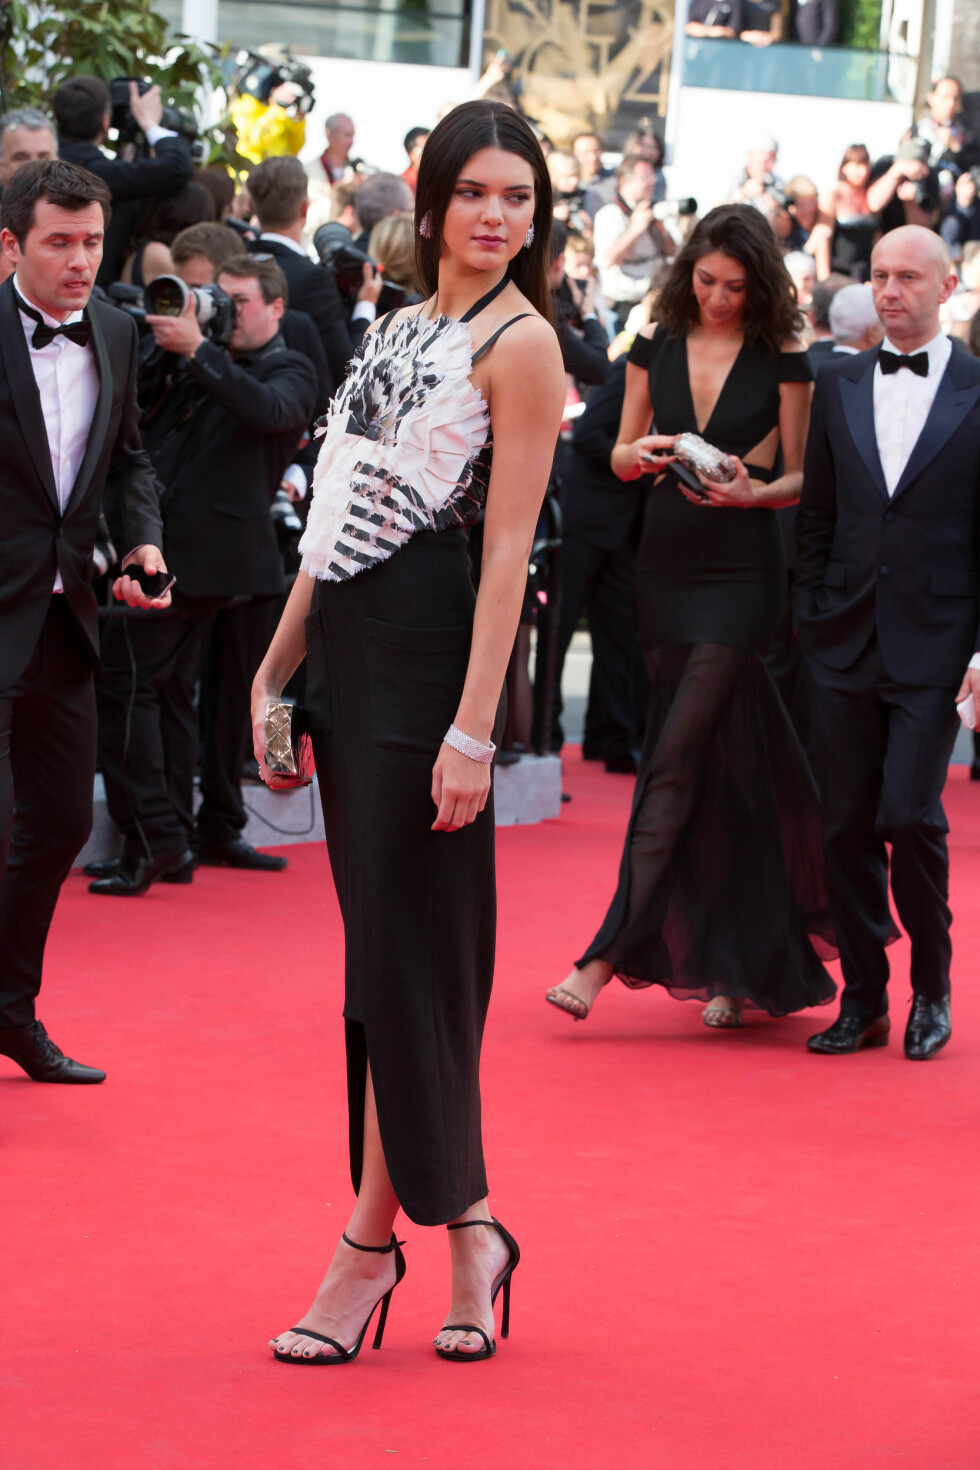 Kardashian-familiens nye motespire kom i en lang sort Chanel-kjole med hvite fjærdekorasjoner over brystet. Svarte stroppesandaler, en sølvfarget clutch og ringer fra Chopard var tilbehør.  Foto: Stella Pictures